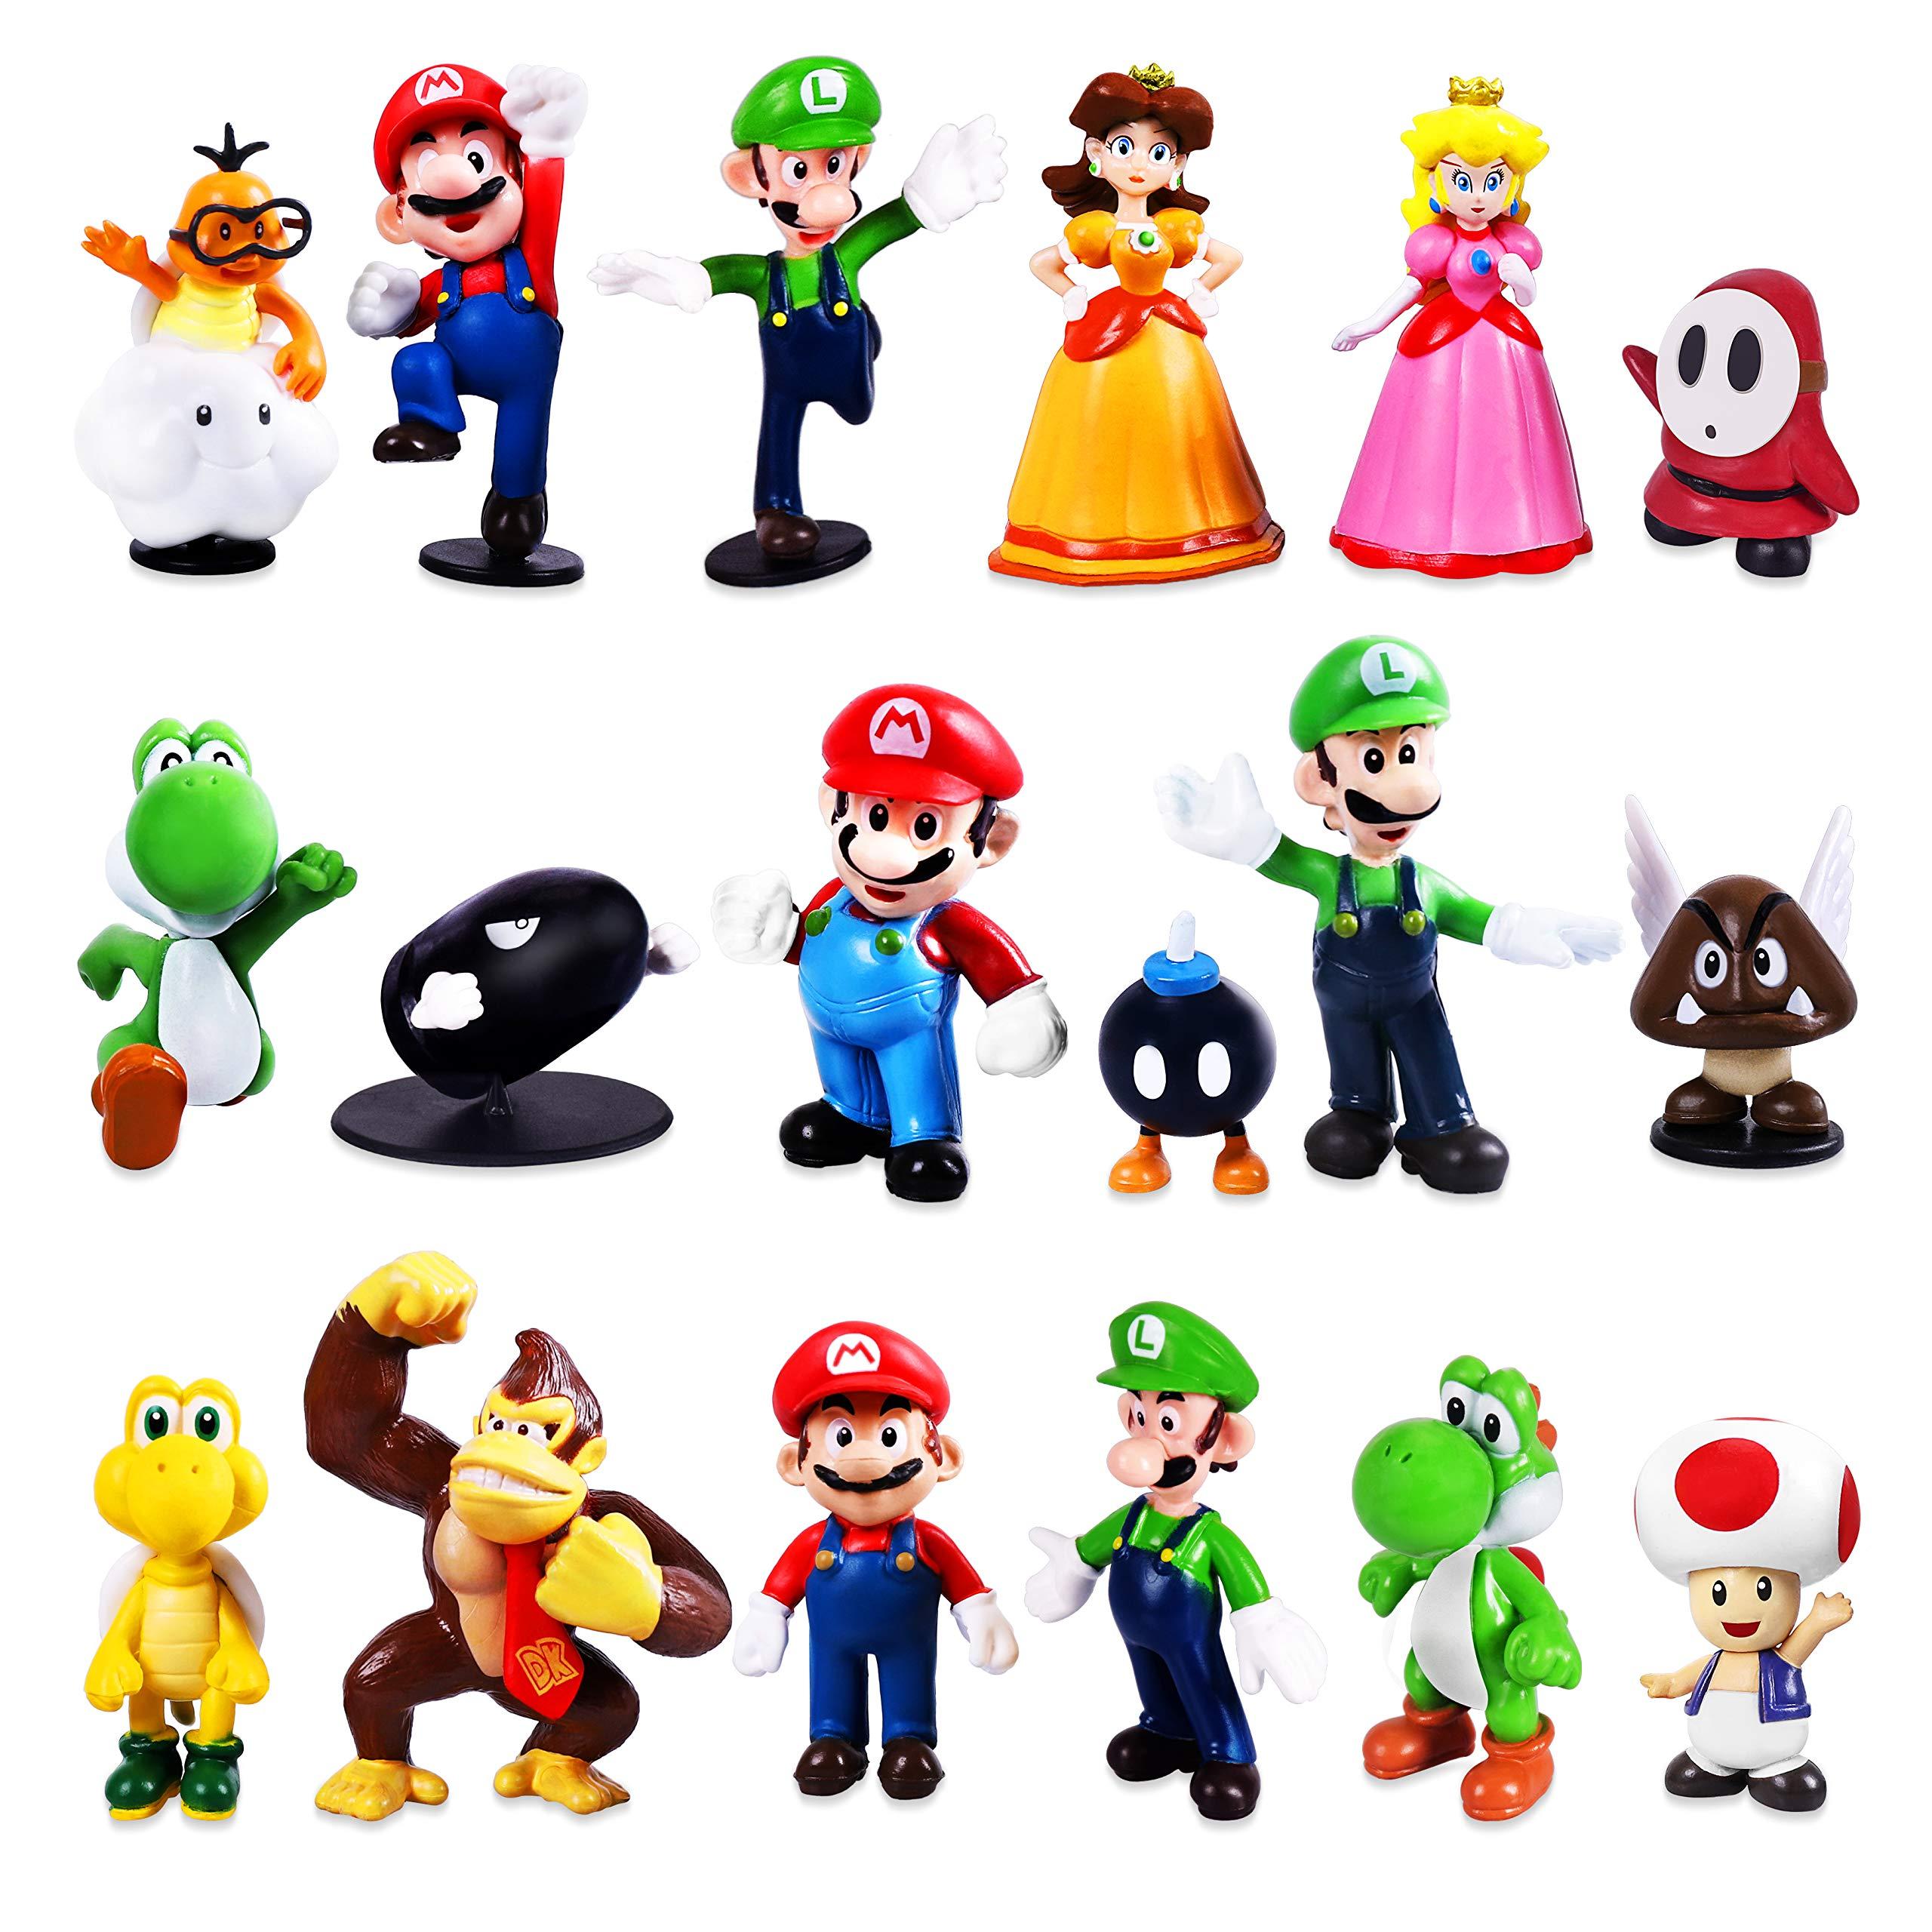 18pcs Super Mario Luggi Bros Action Figures Cake topper Kids Toy Set figurines